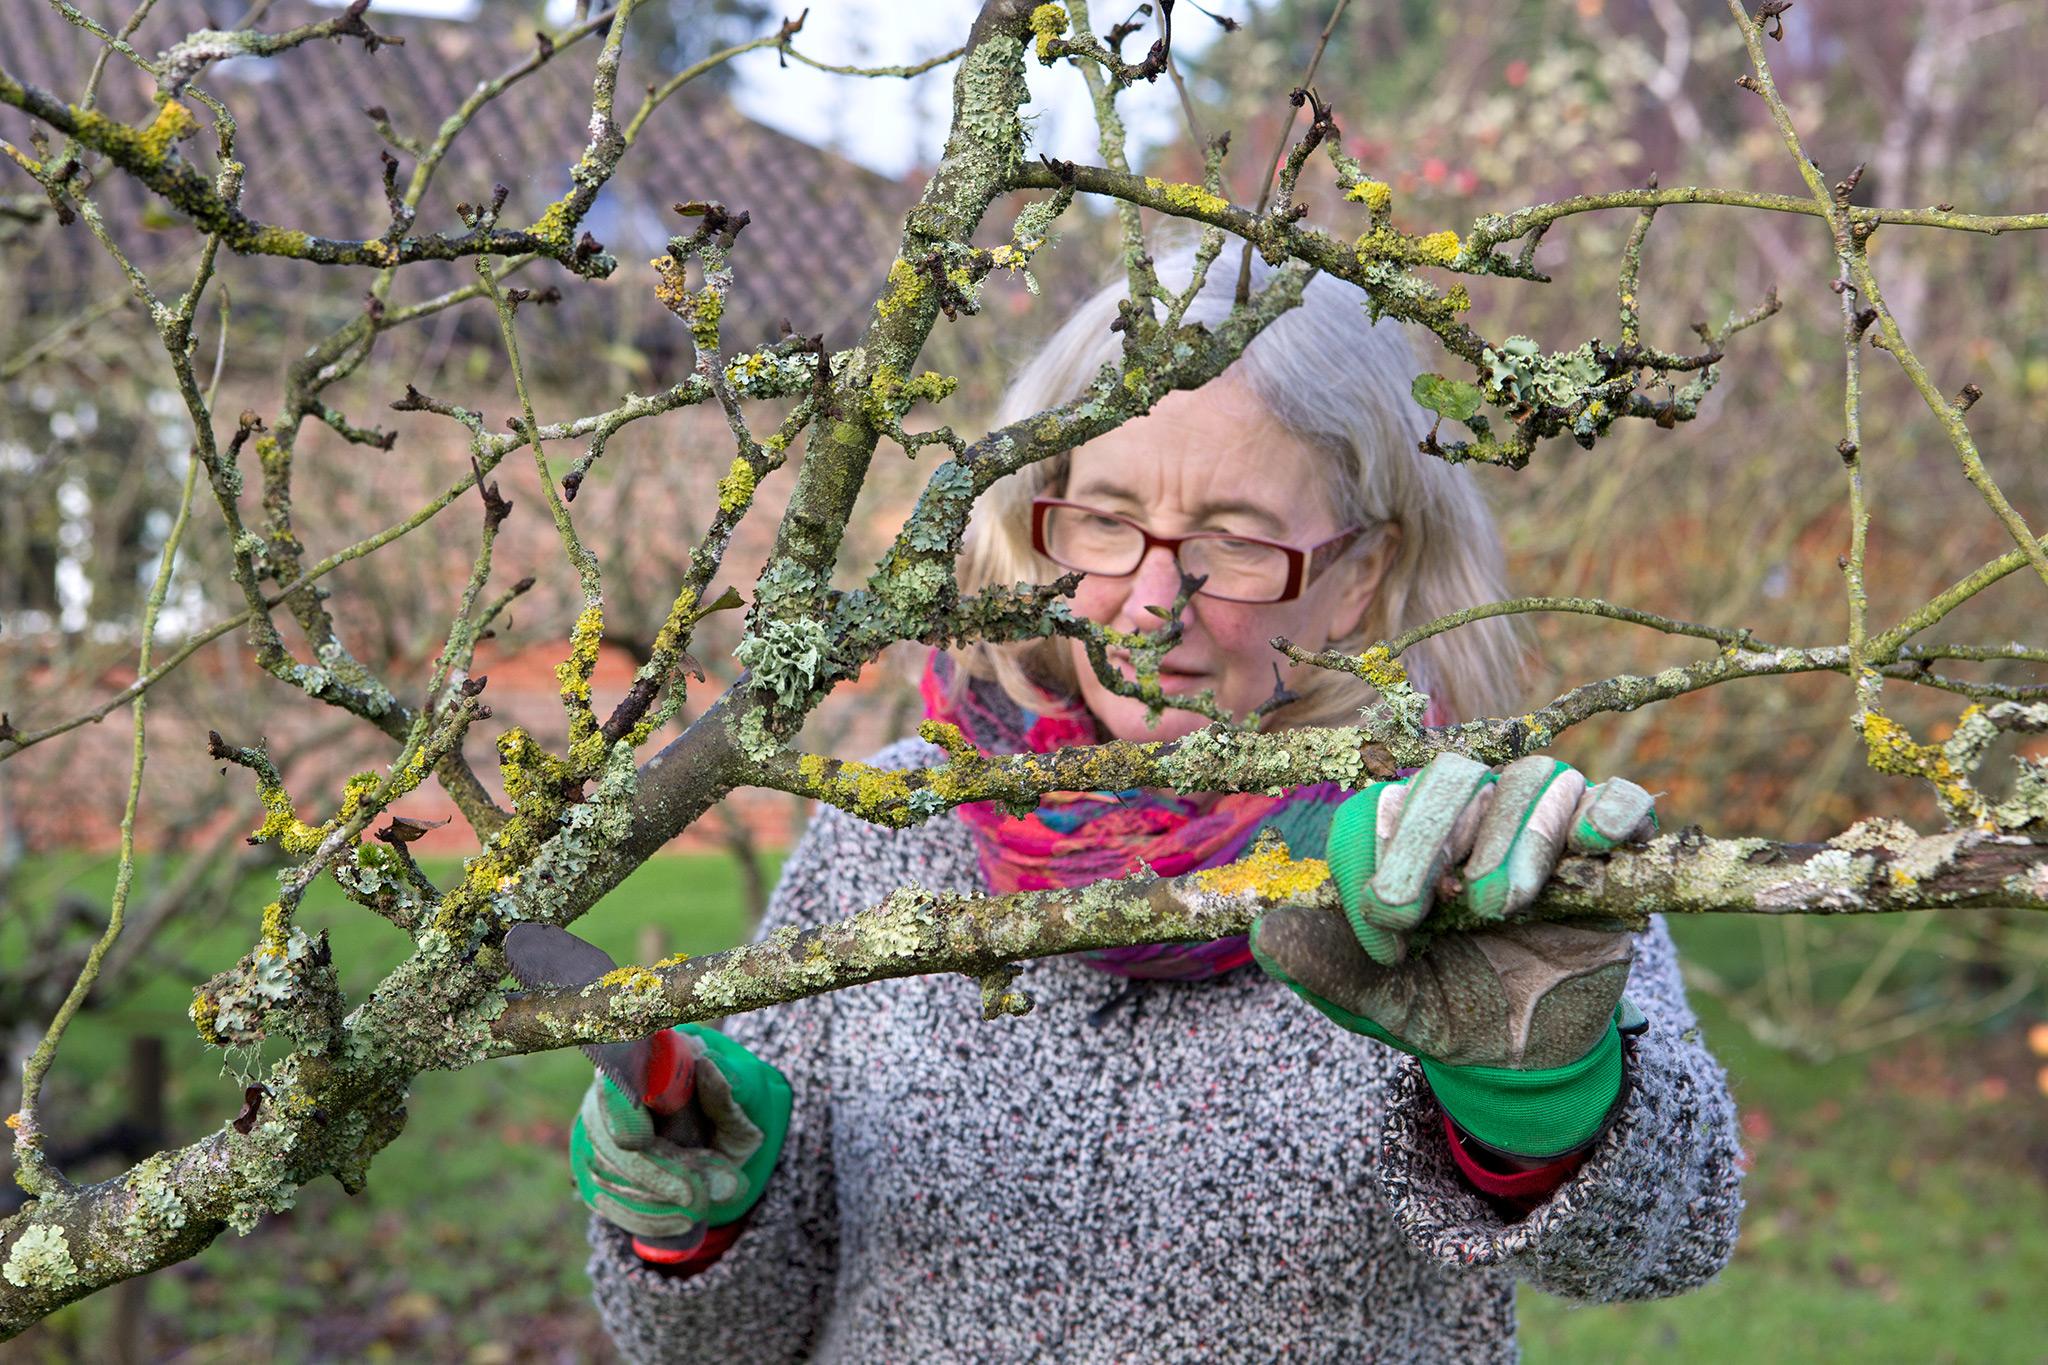 pruning-an-apple-tree-in-winter-3